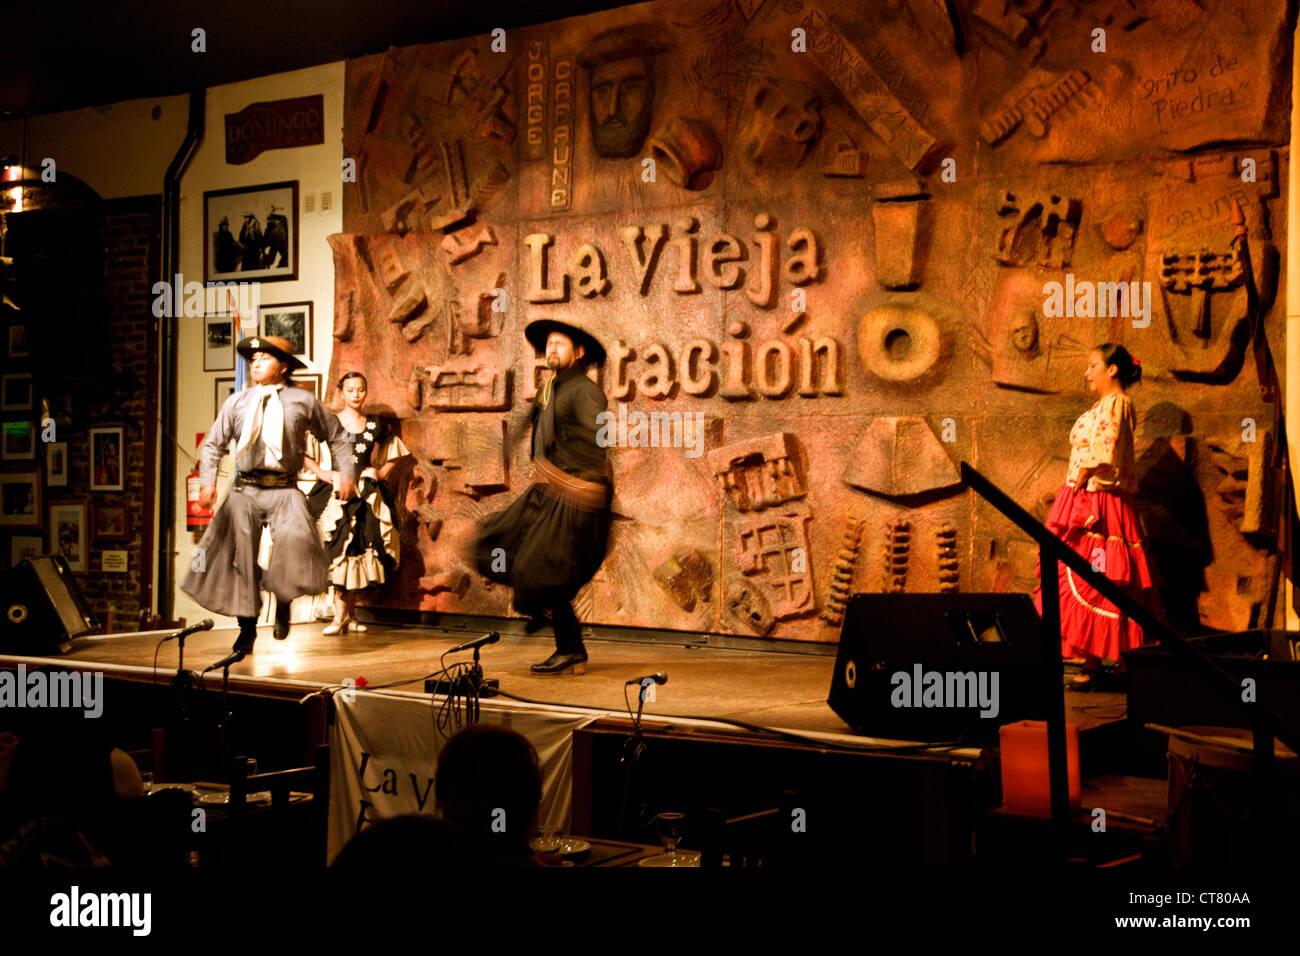 Penas or local folk music at the La Vieja Estacion - Stock Image